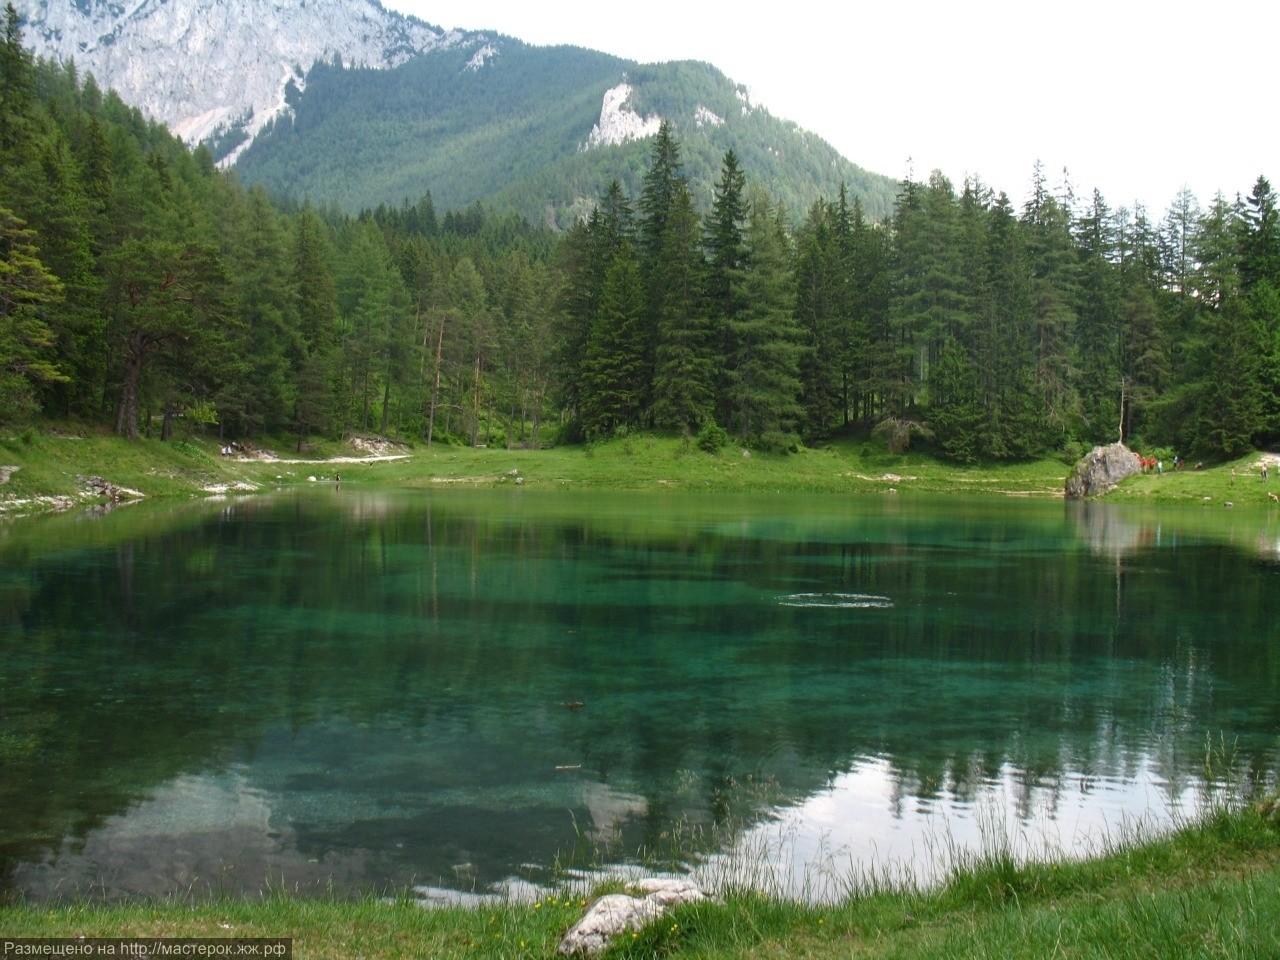 Зелёное озеро (Grüner See)